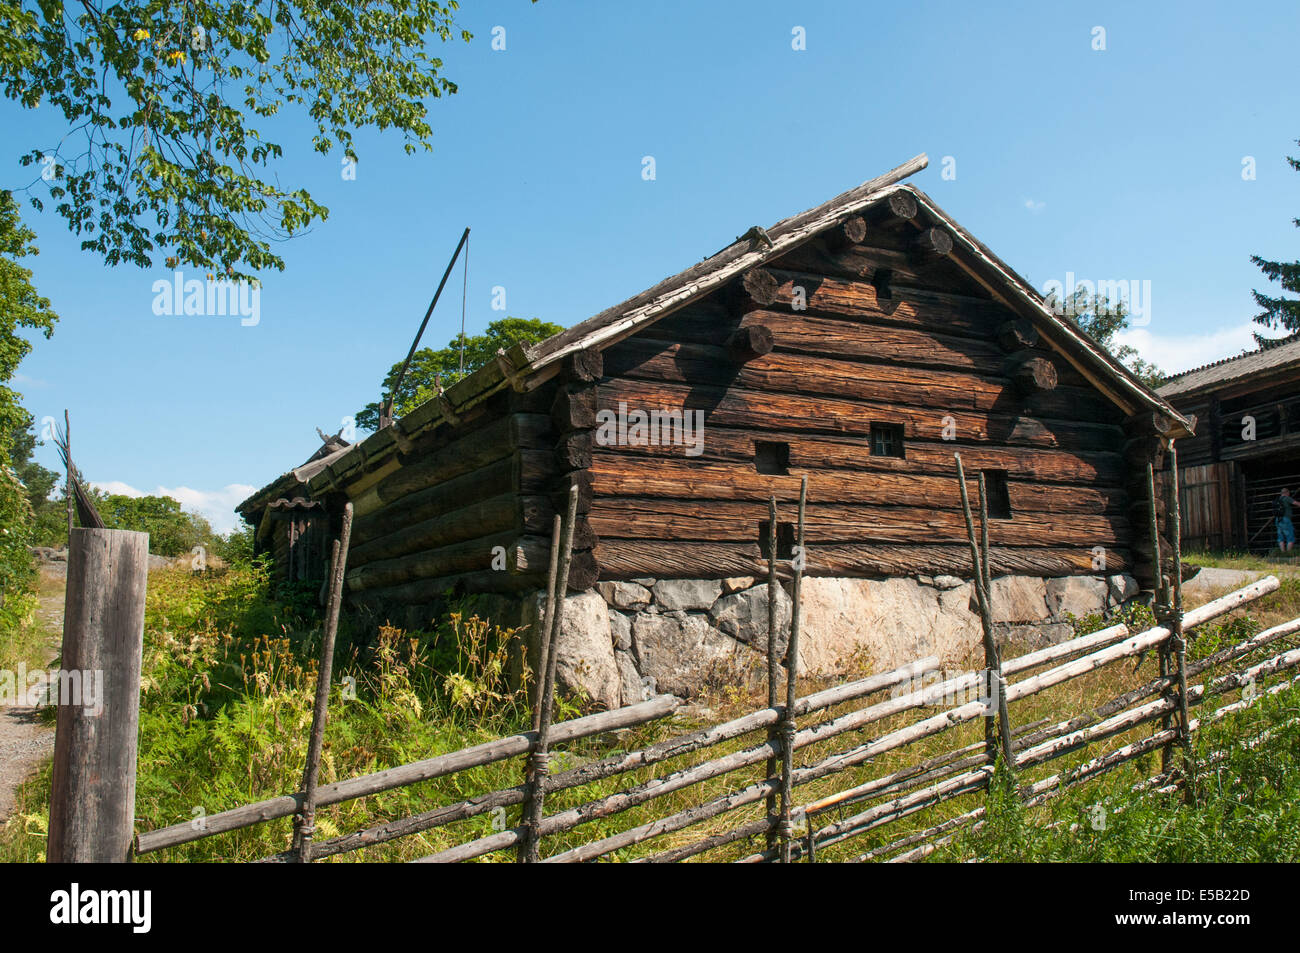 Farm cottage at Skansen open air museum, Djurgarden, Stockholm - Stock Image